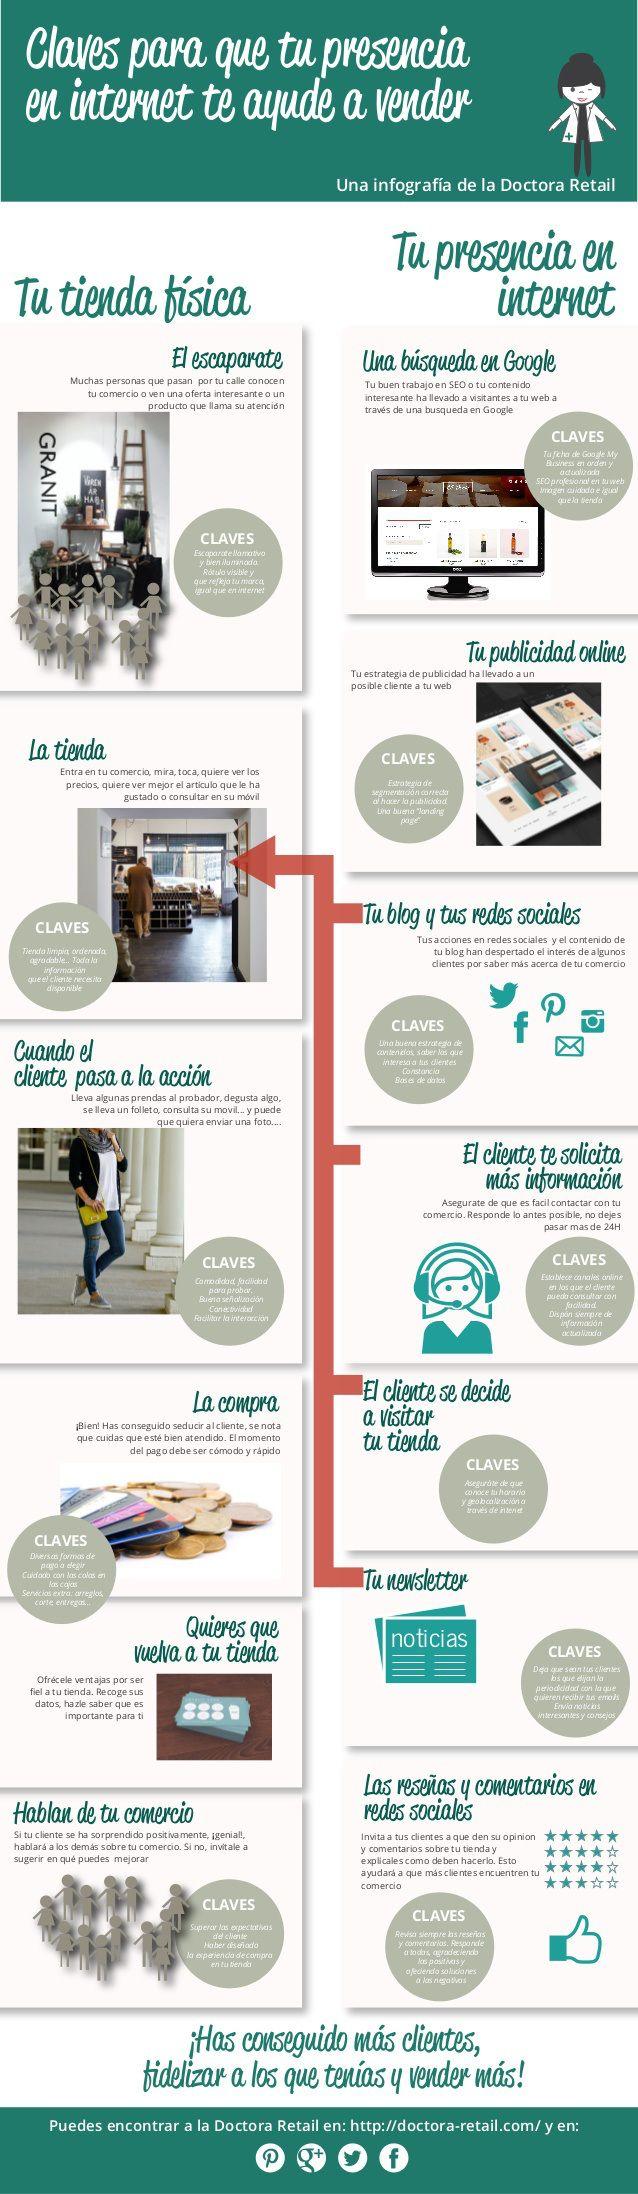 Claves para que tu presencia en Internet te ayude a vender #infografia #infographic #marketing